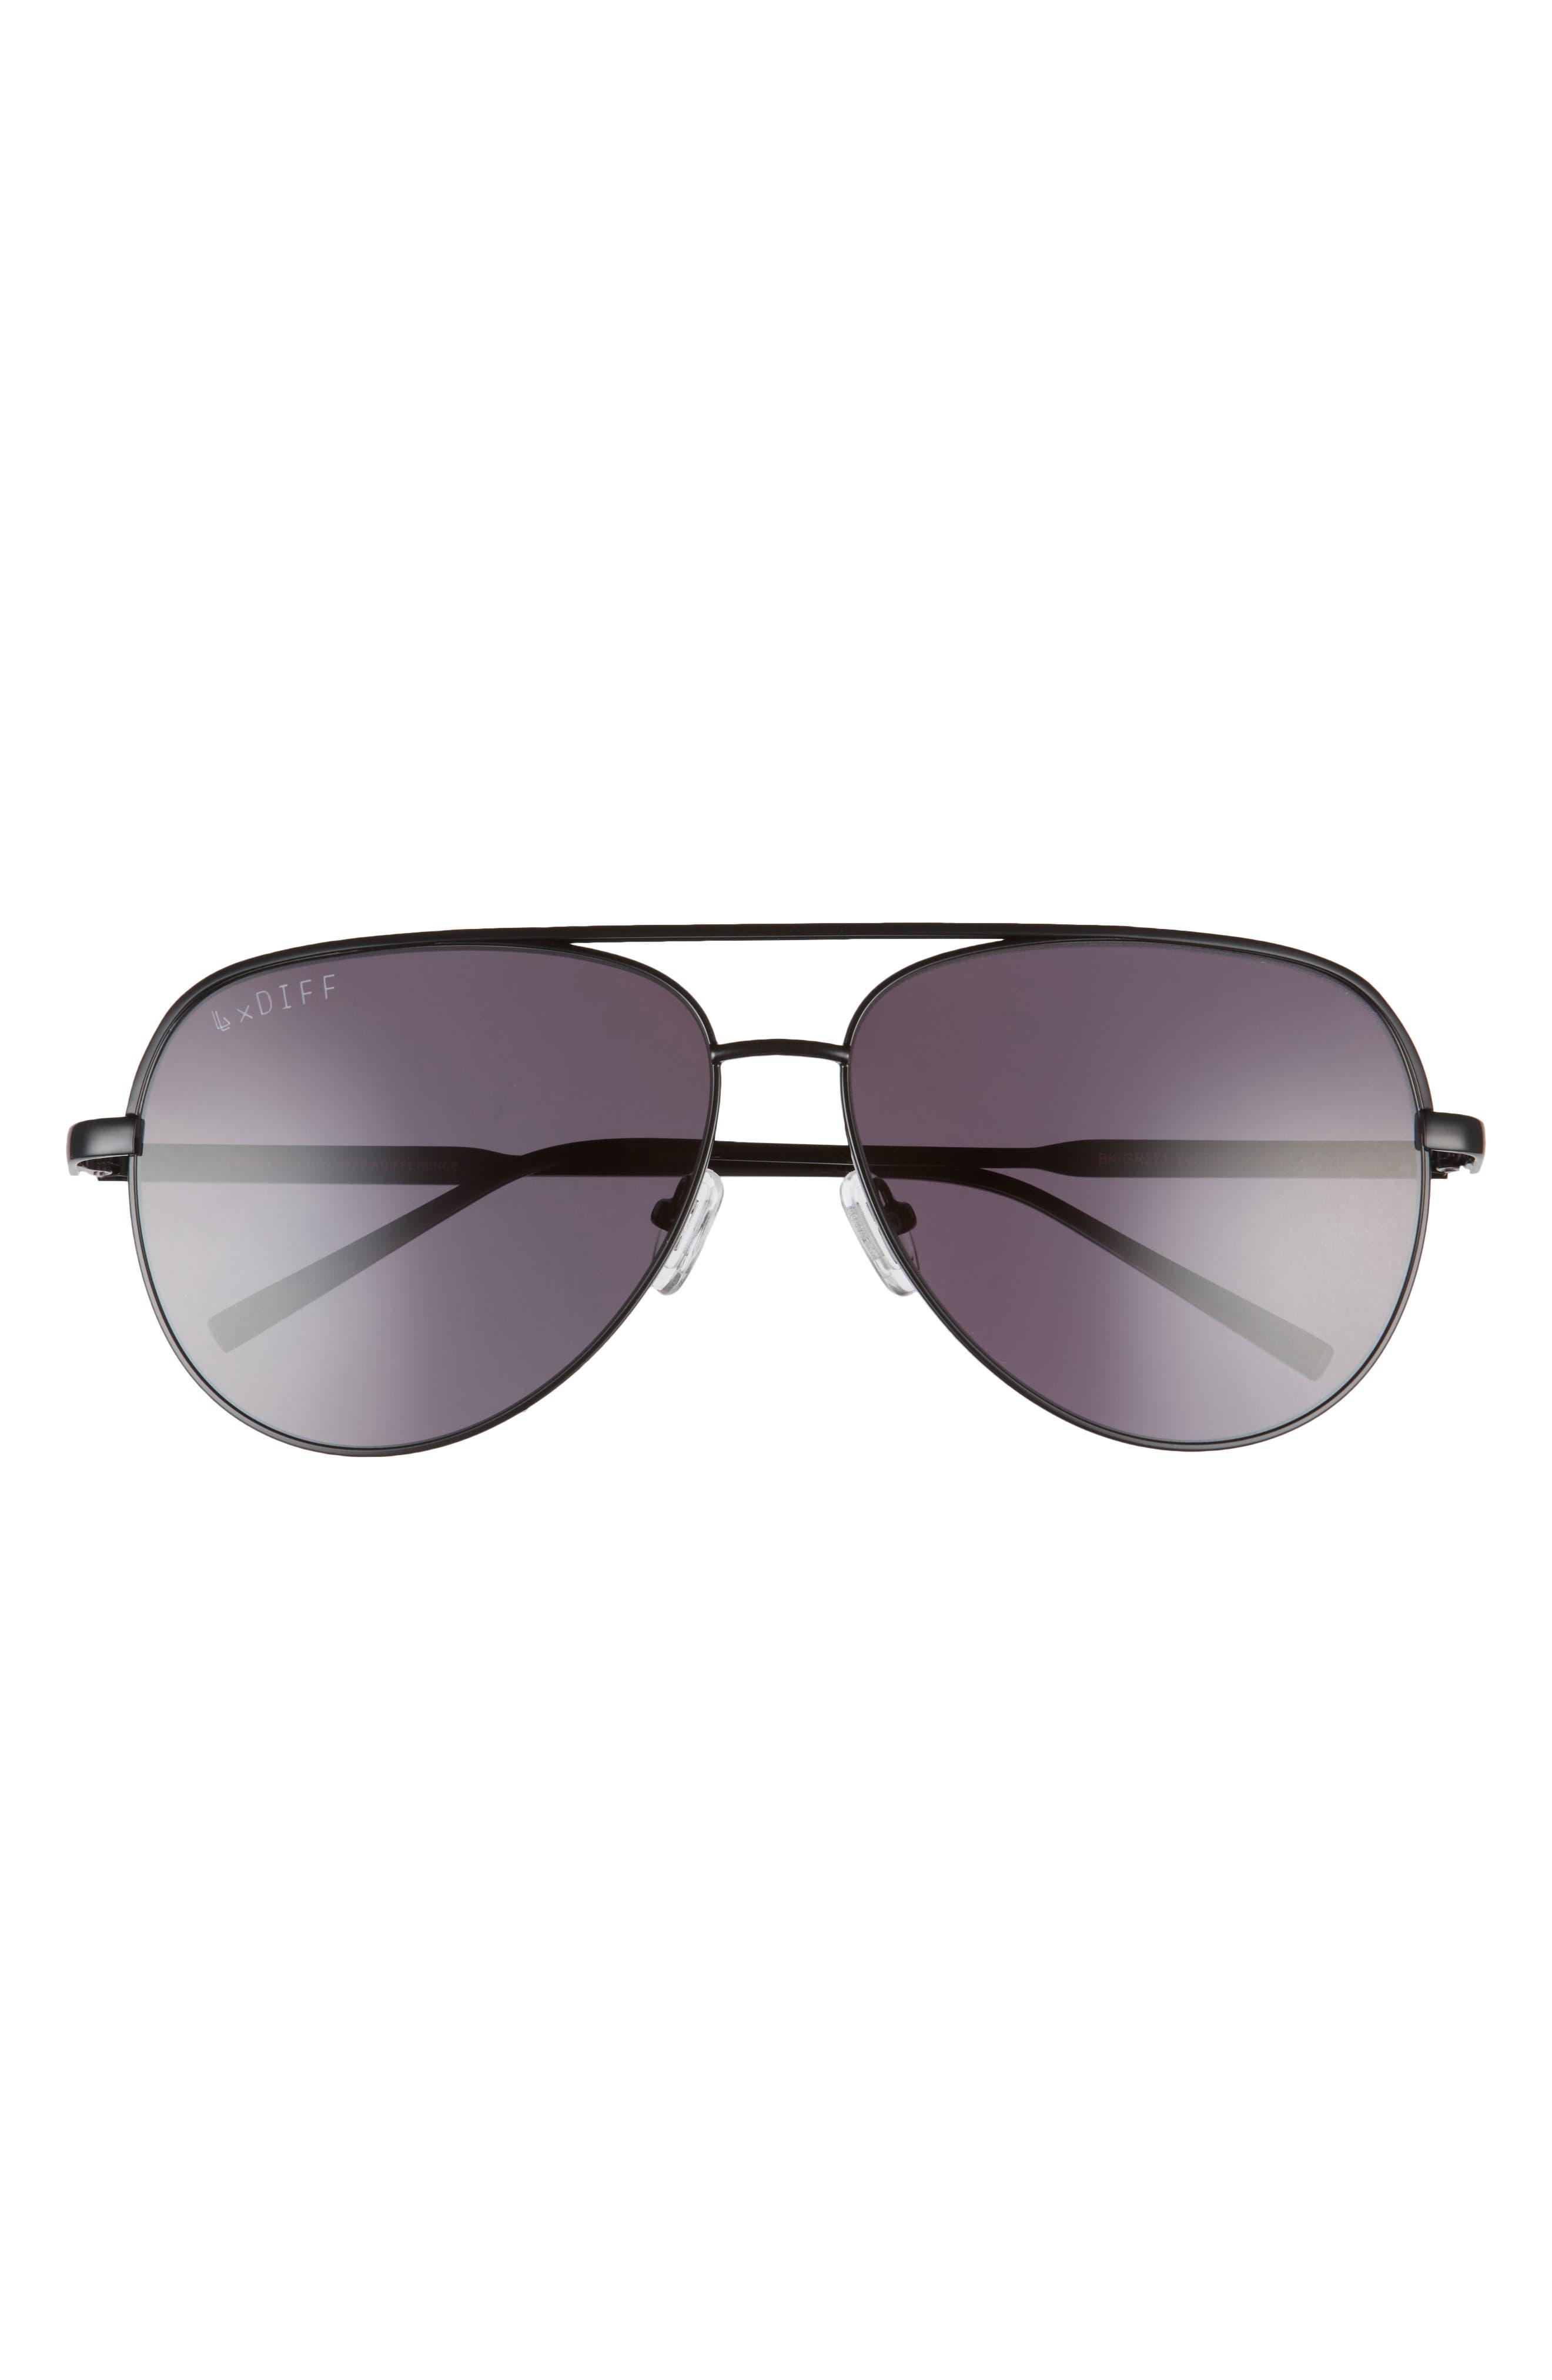 X Lauren London California Soul 64mm Aviator Sunglasses